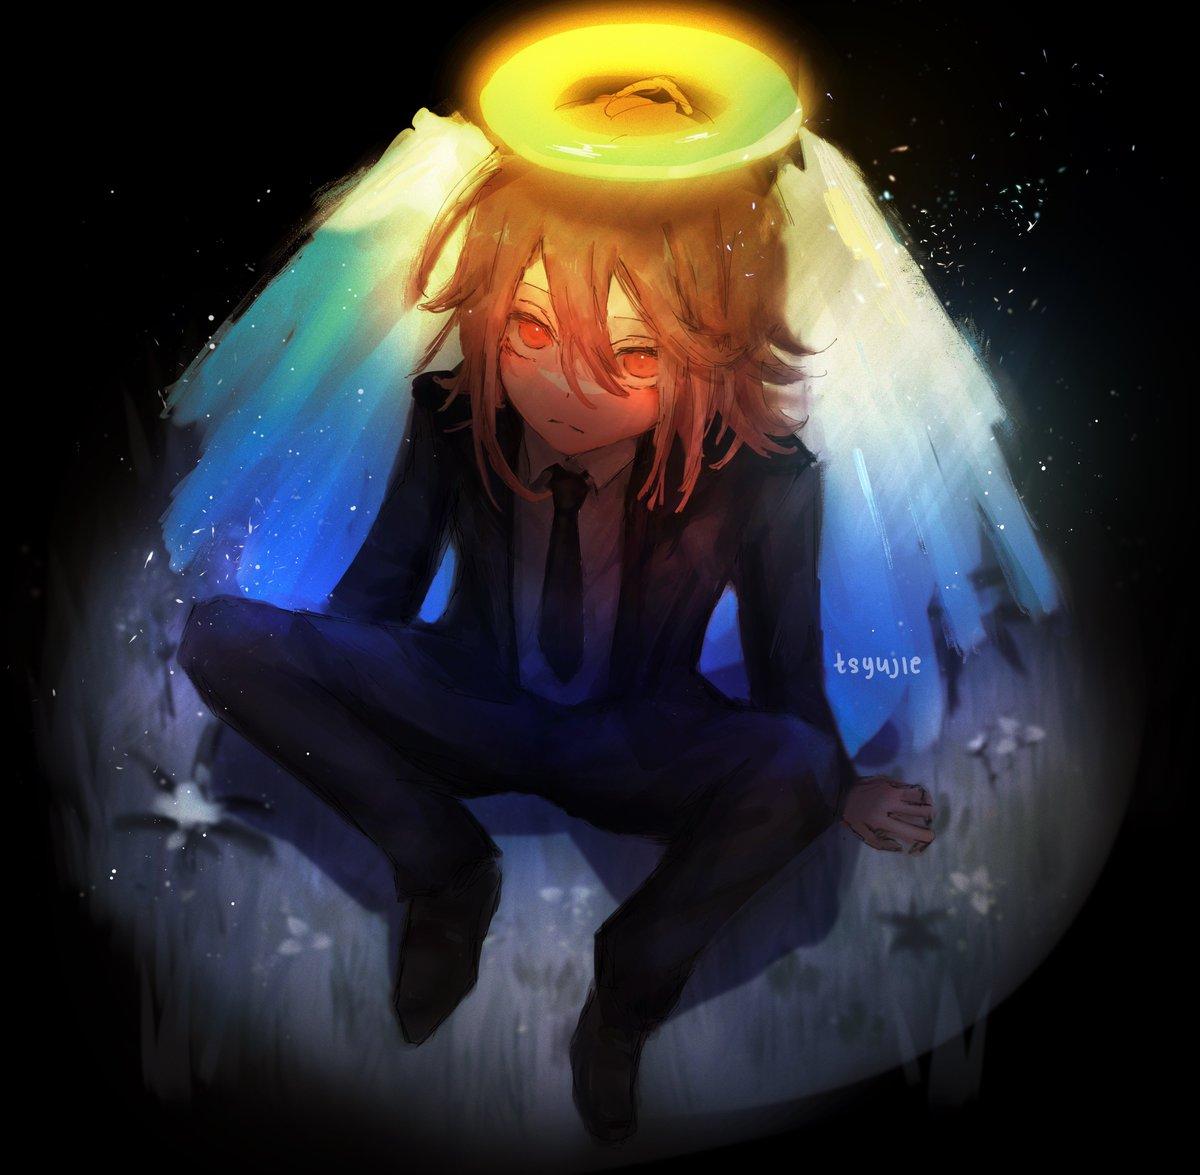 angel devil !  #チェンソーマン #chainsawman #csm #illustration